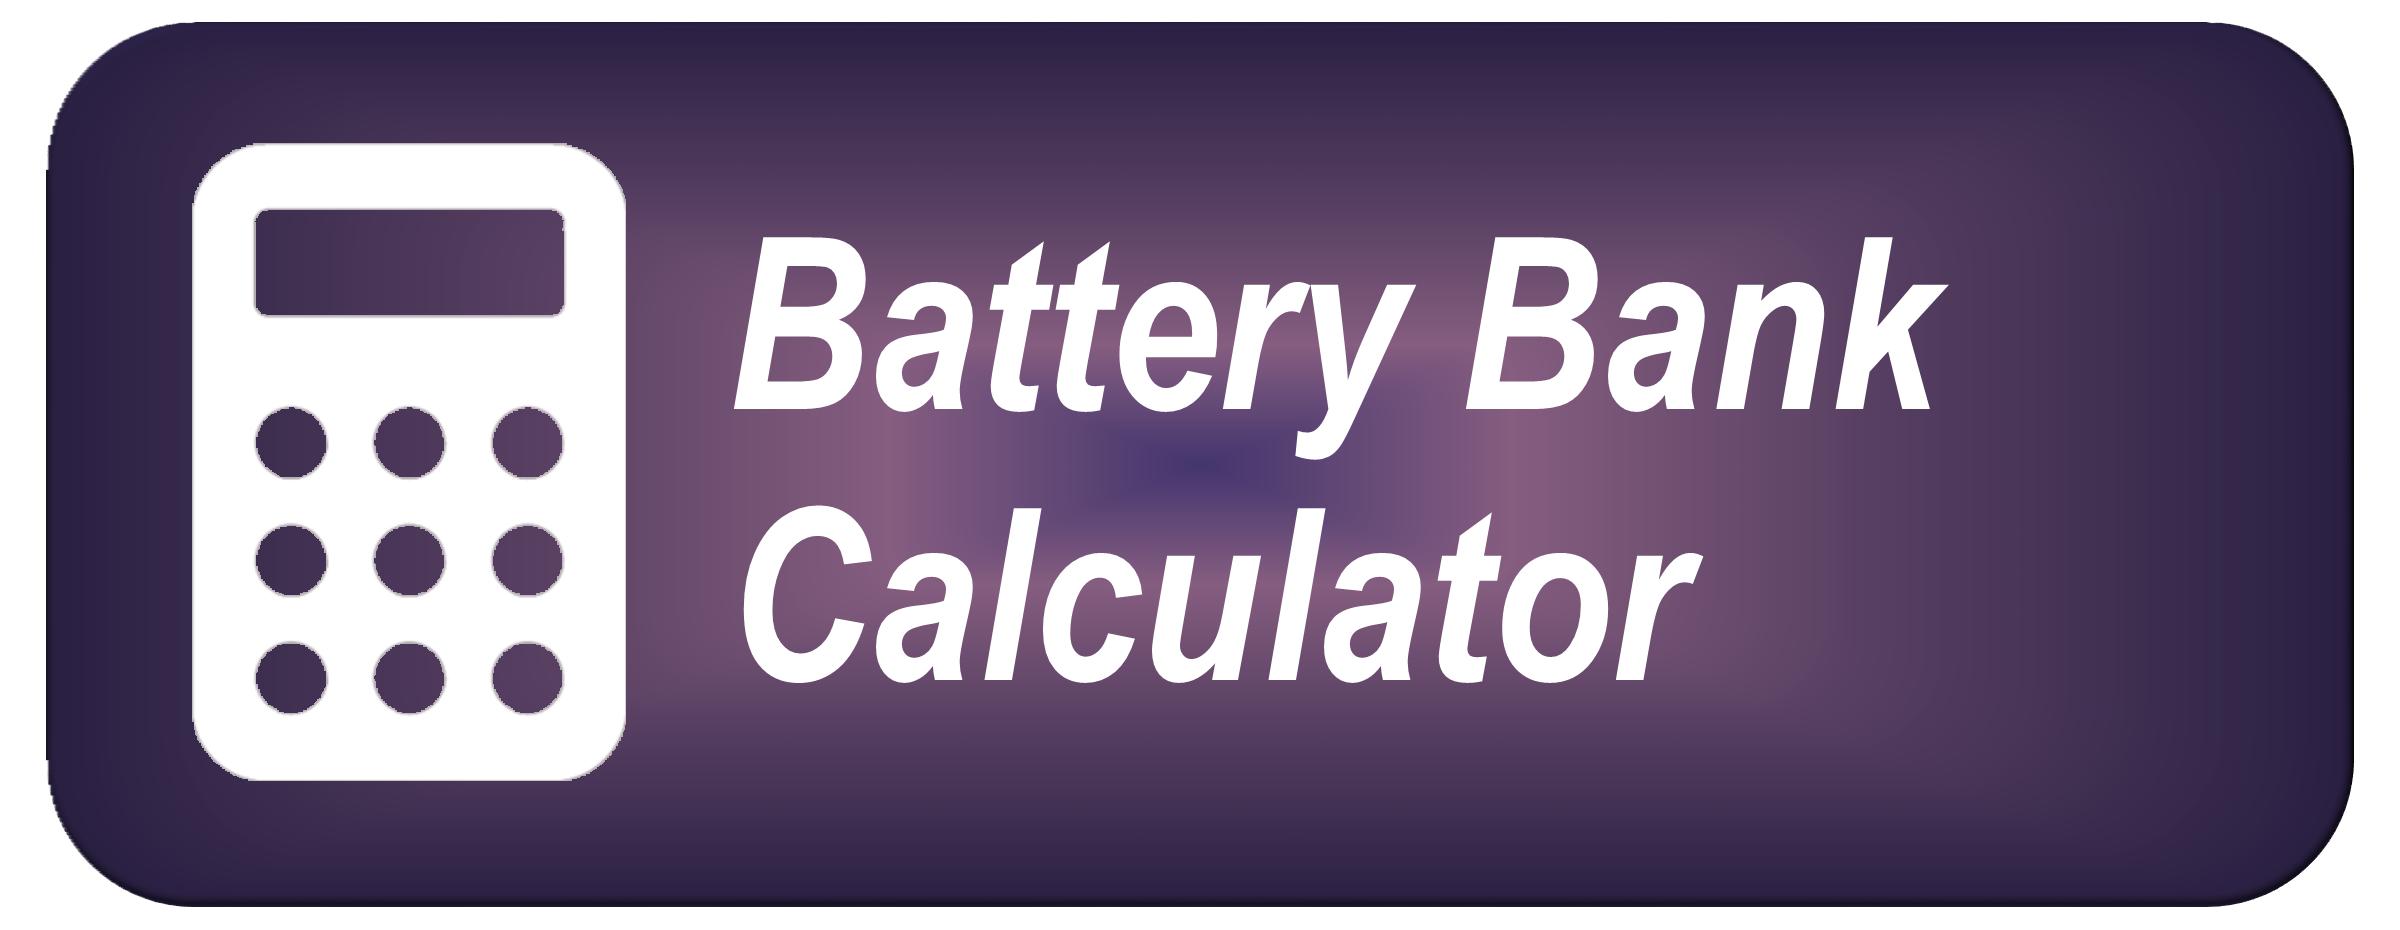 Battery Bank Calculator